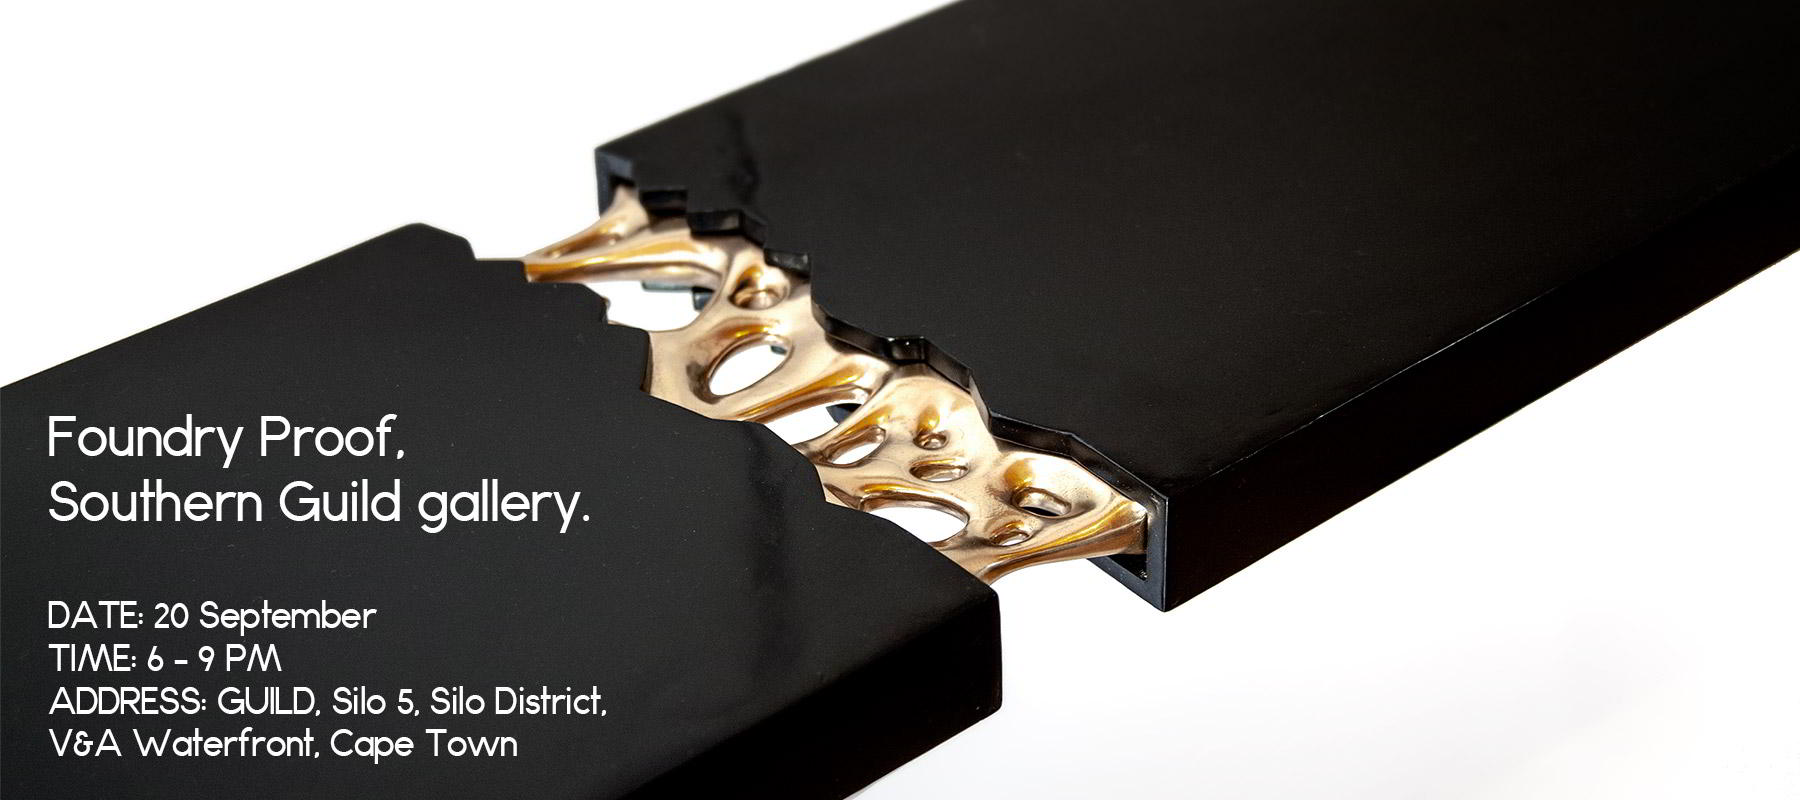 Foundry proof exhibition bronze sculpture table invite